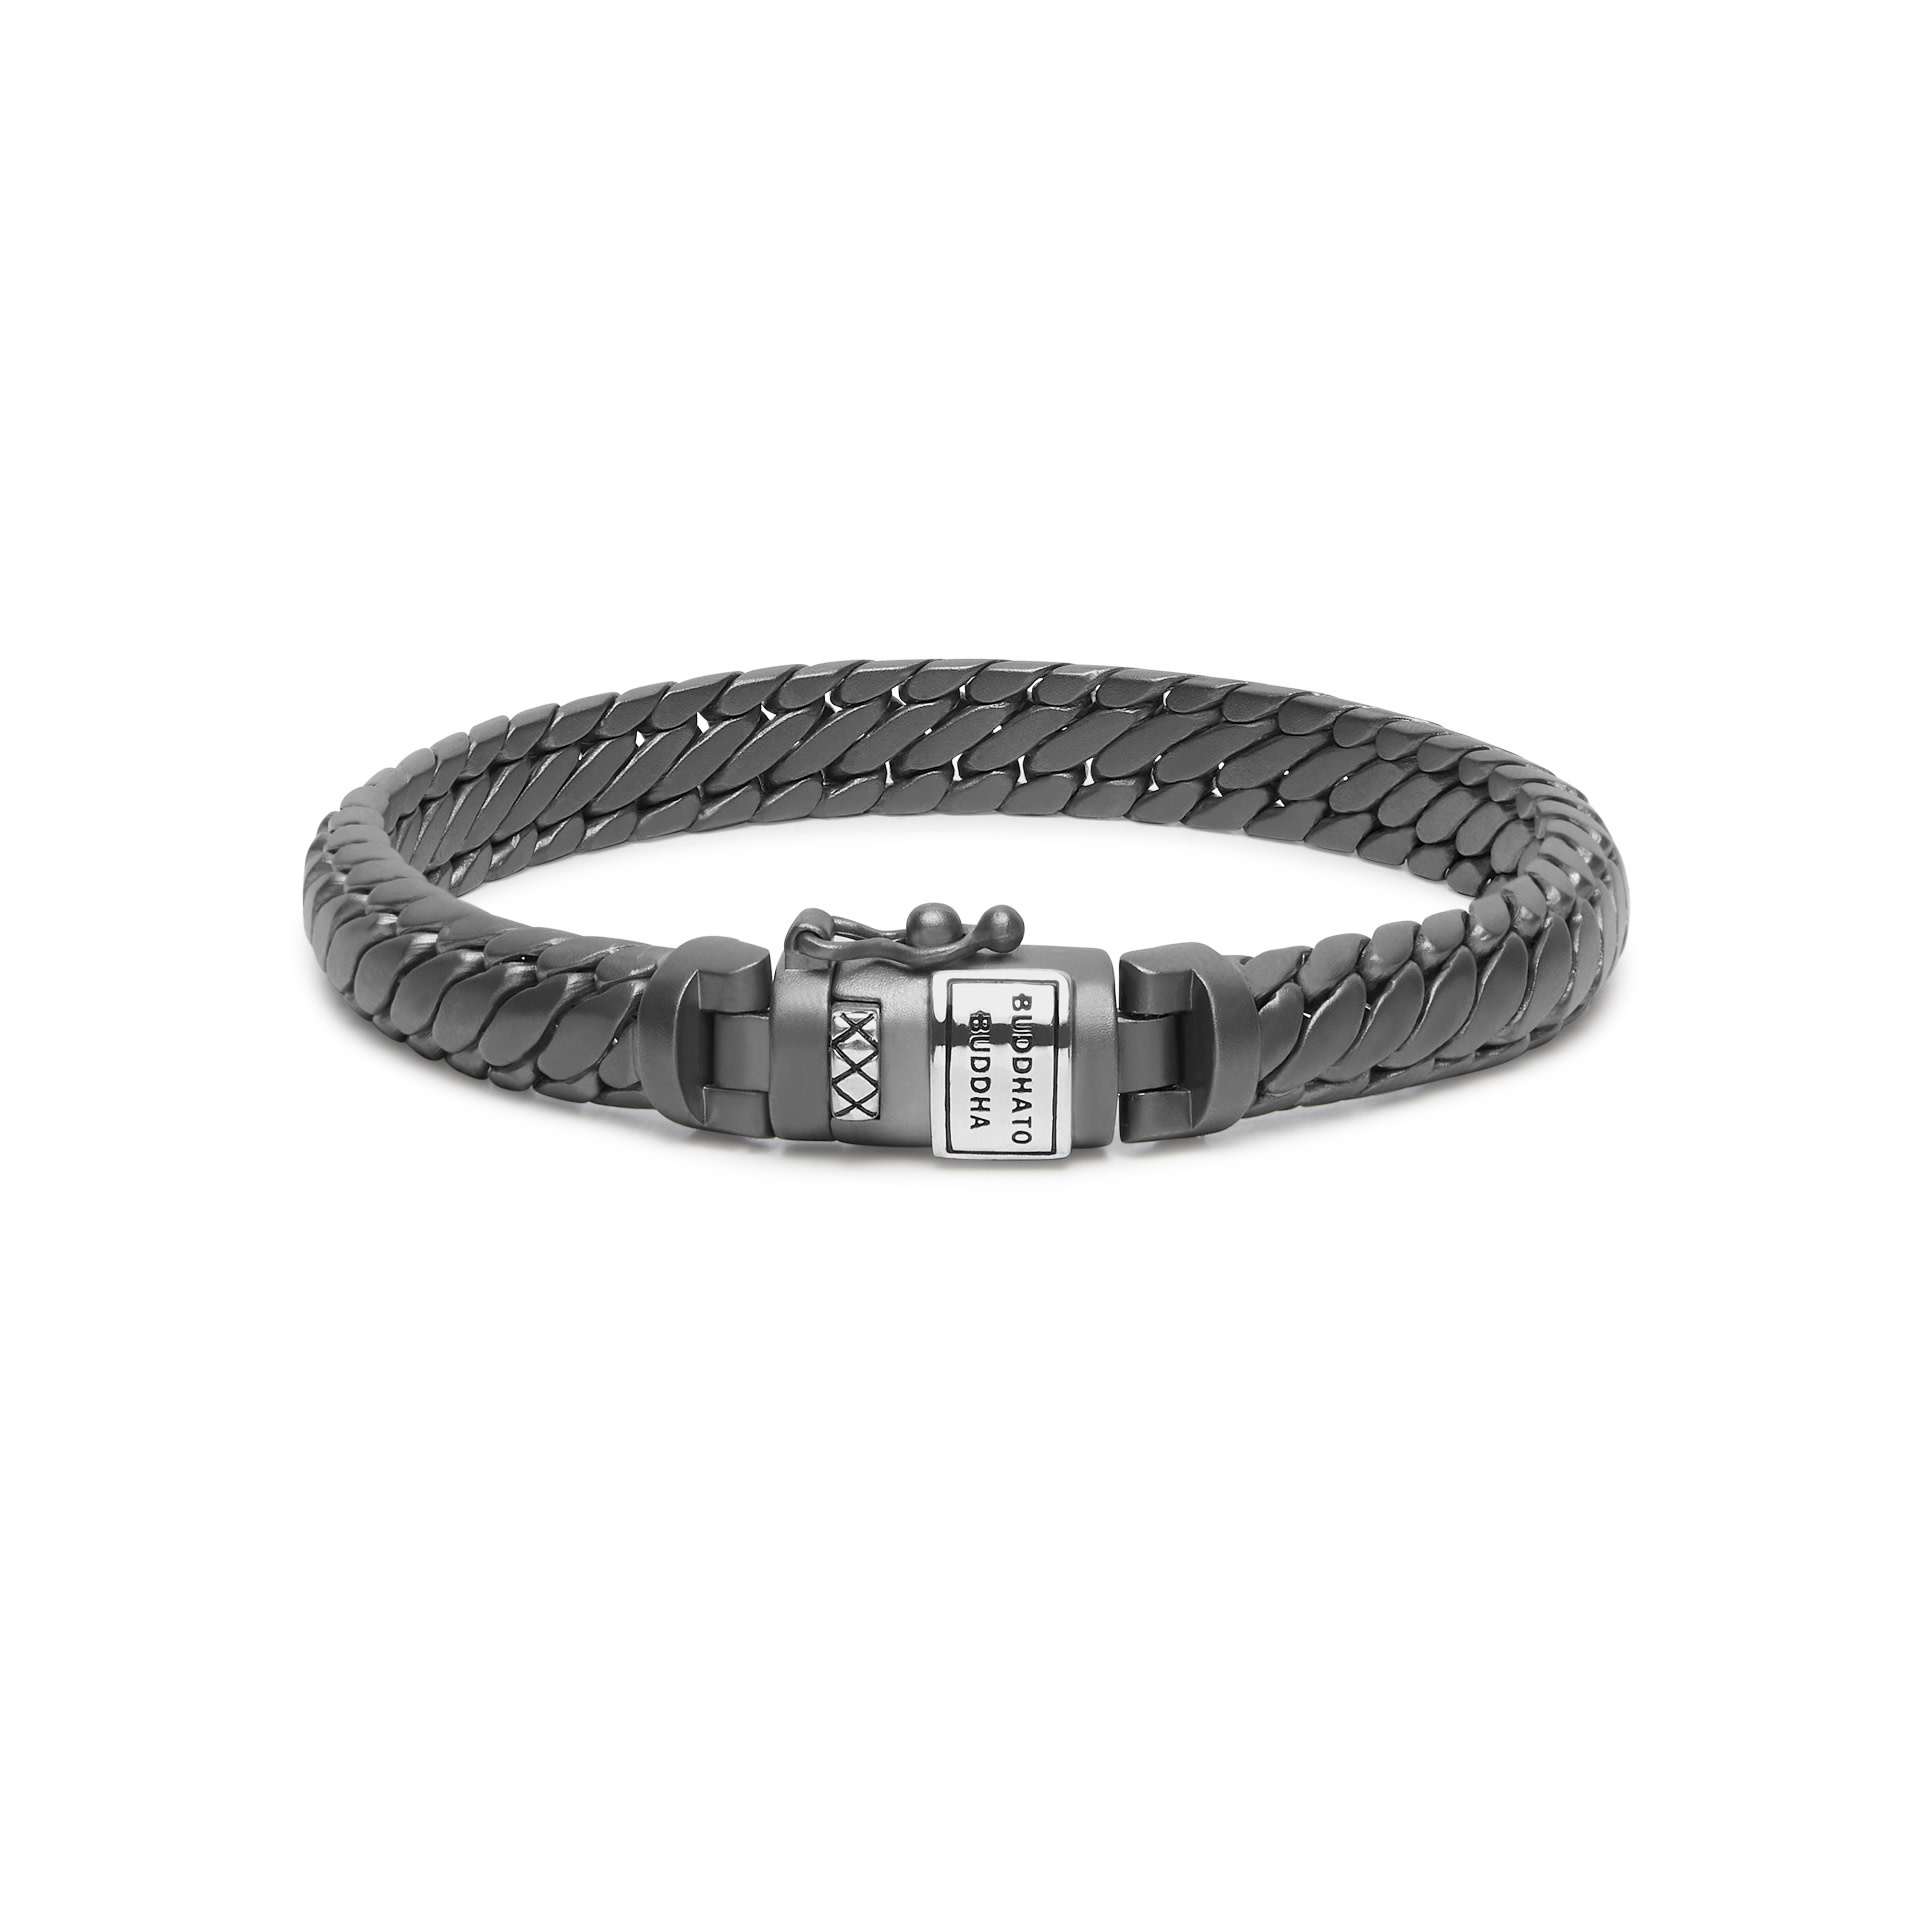 Bracelet Ben XS Black Rhodium Silver-1